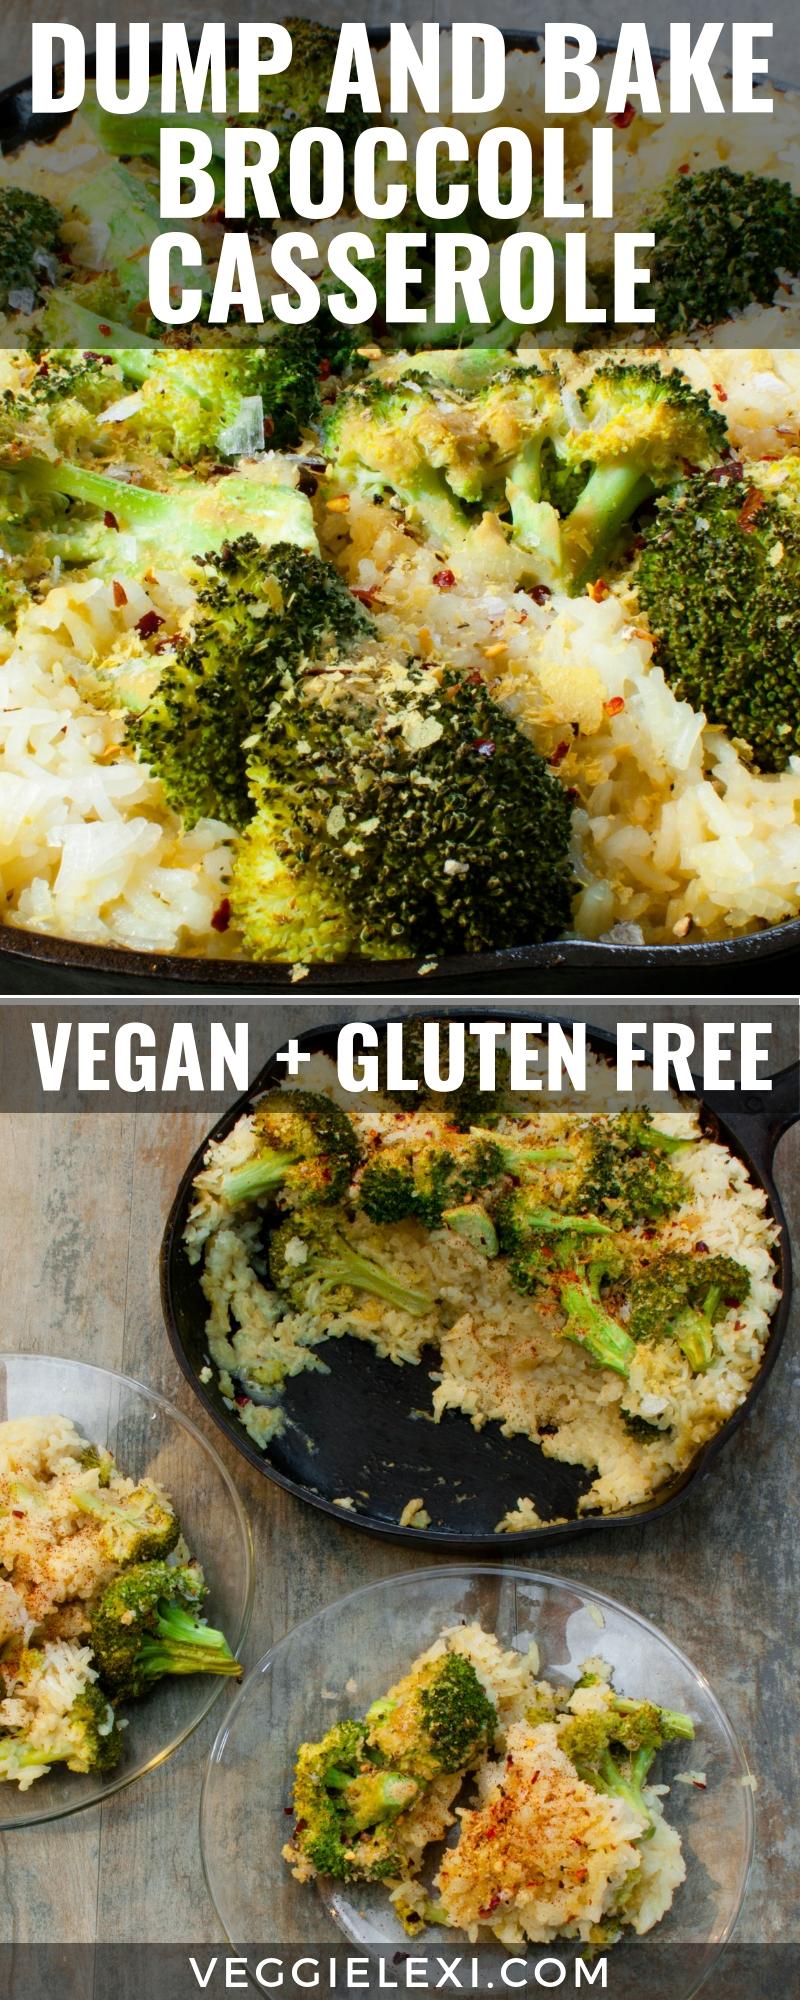 Dump and Bake Cheesy Vegan Gluten Free Casserole - by Veggie Lexi